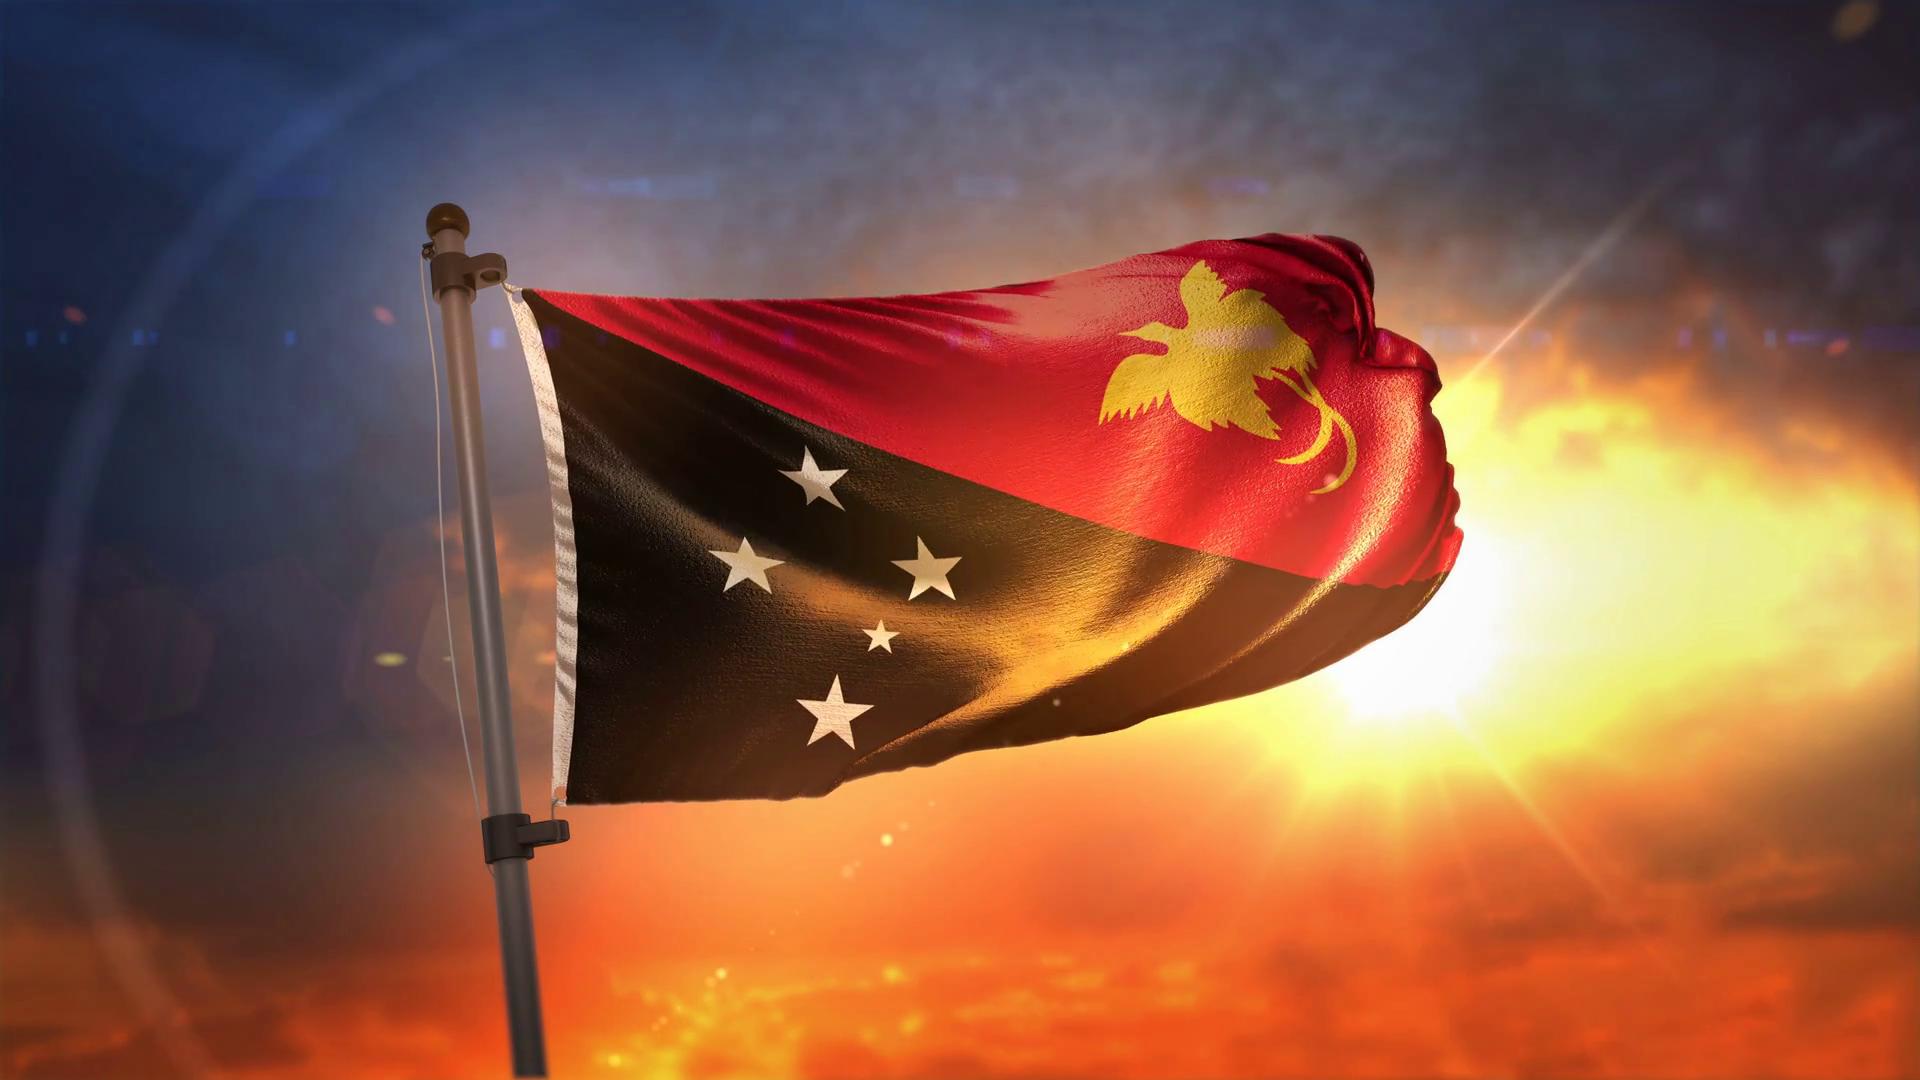 Papua New Guinea Flag Backlit At Beautiful Sunrise Loop Slow 1920x1080